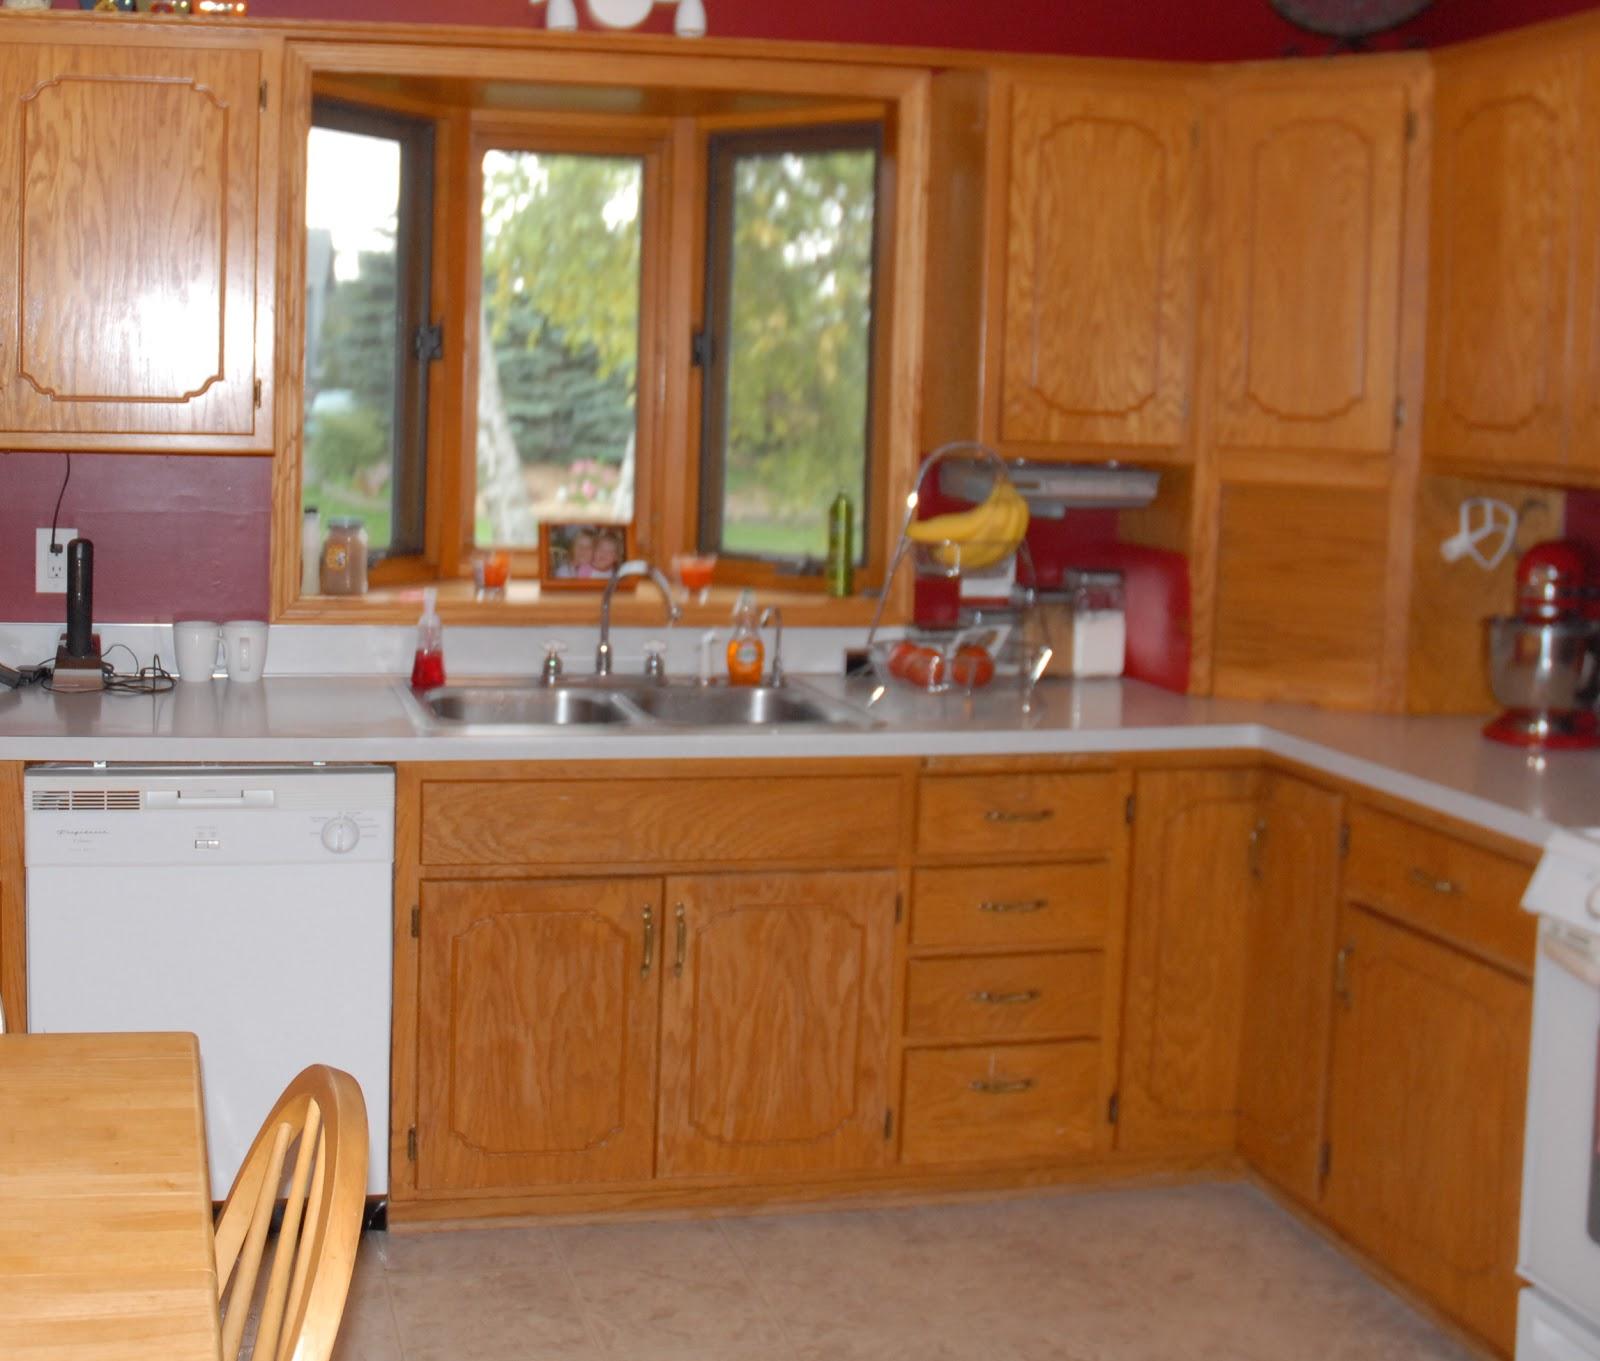 Kitchen Renovation Youtube: House Envy Kitchen Remodel Reveal